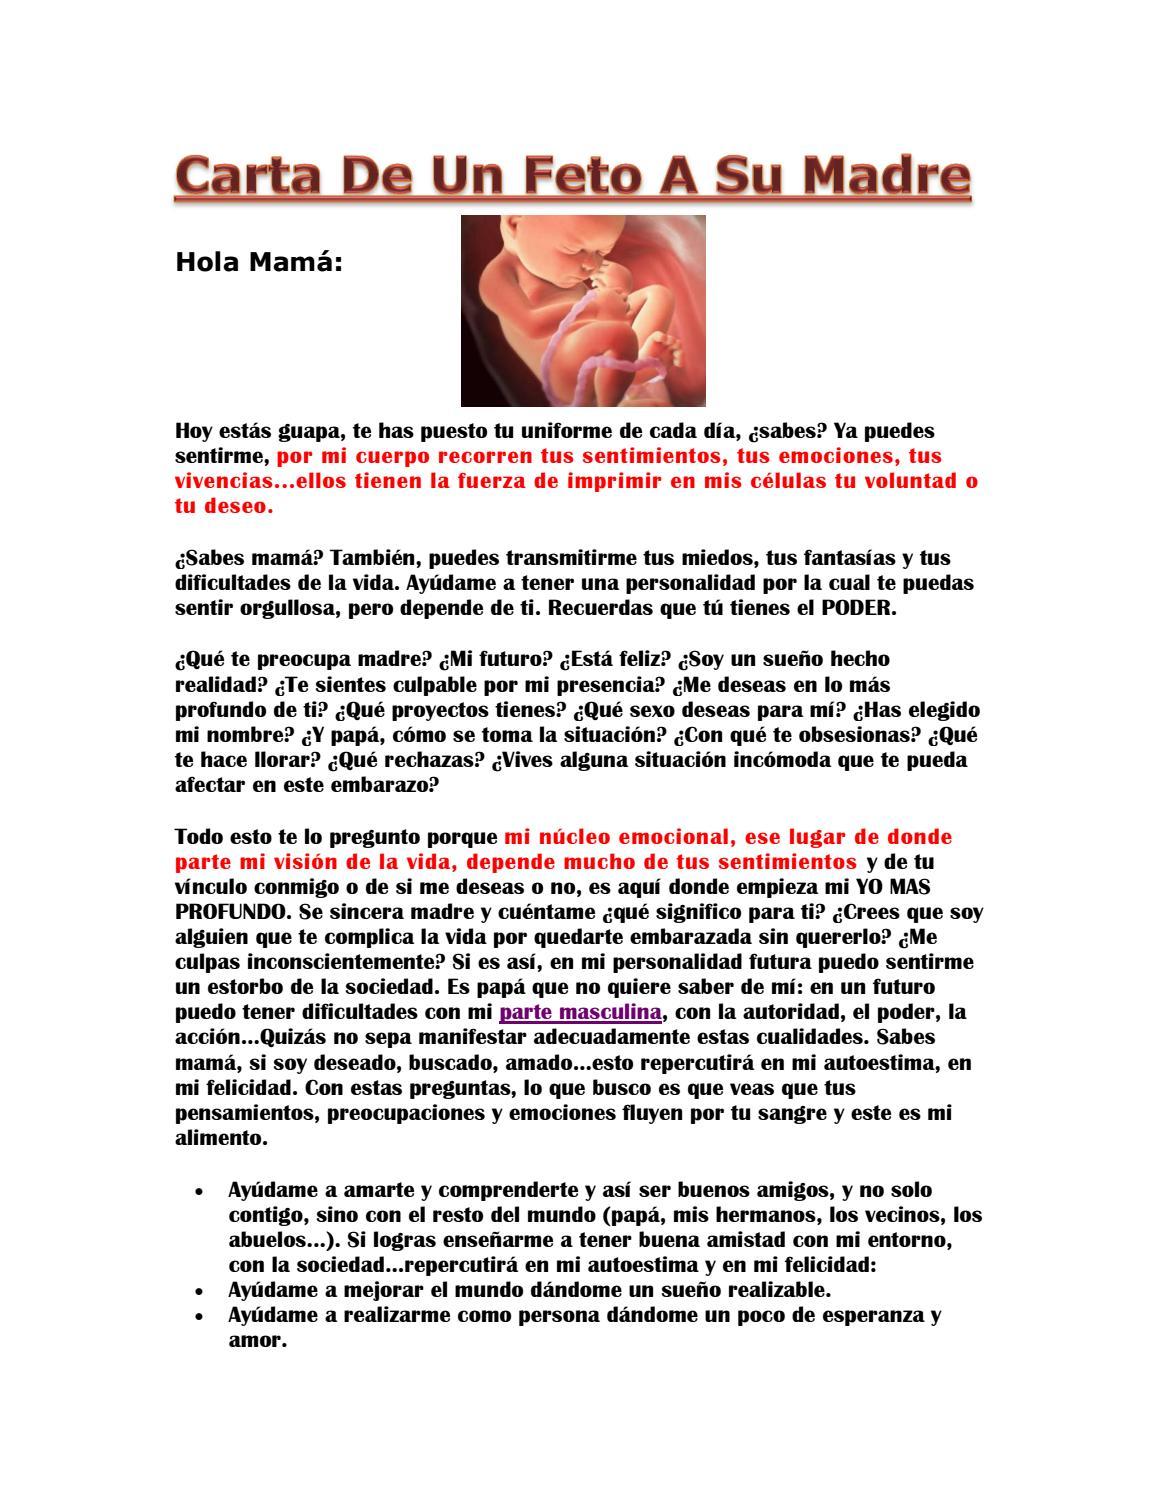 Carta De Un Feto A Su Madre By Gmail9926 Issuu